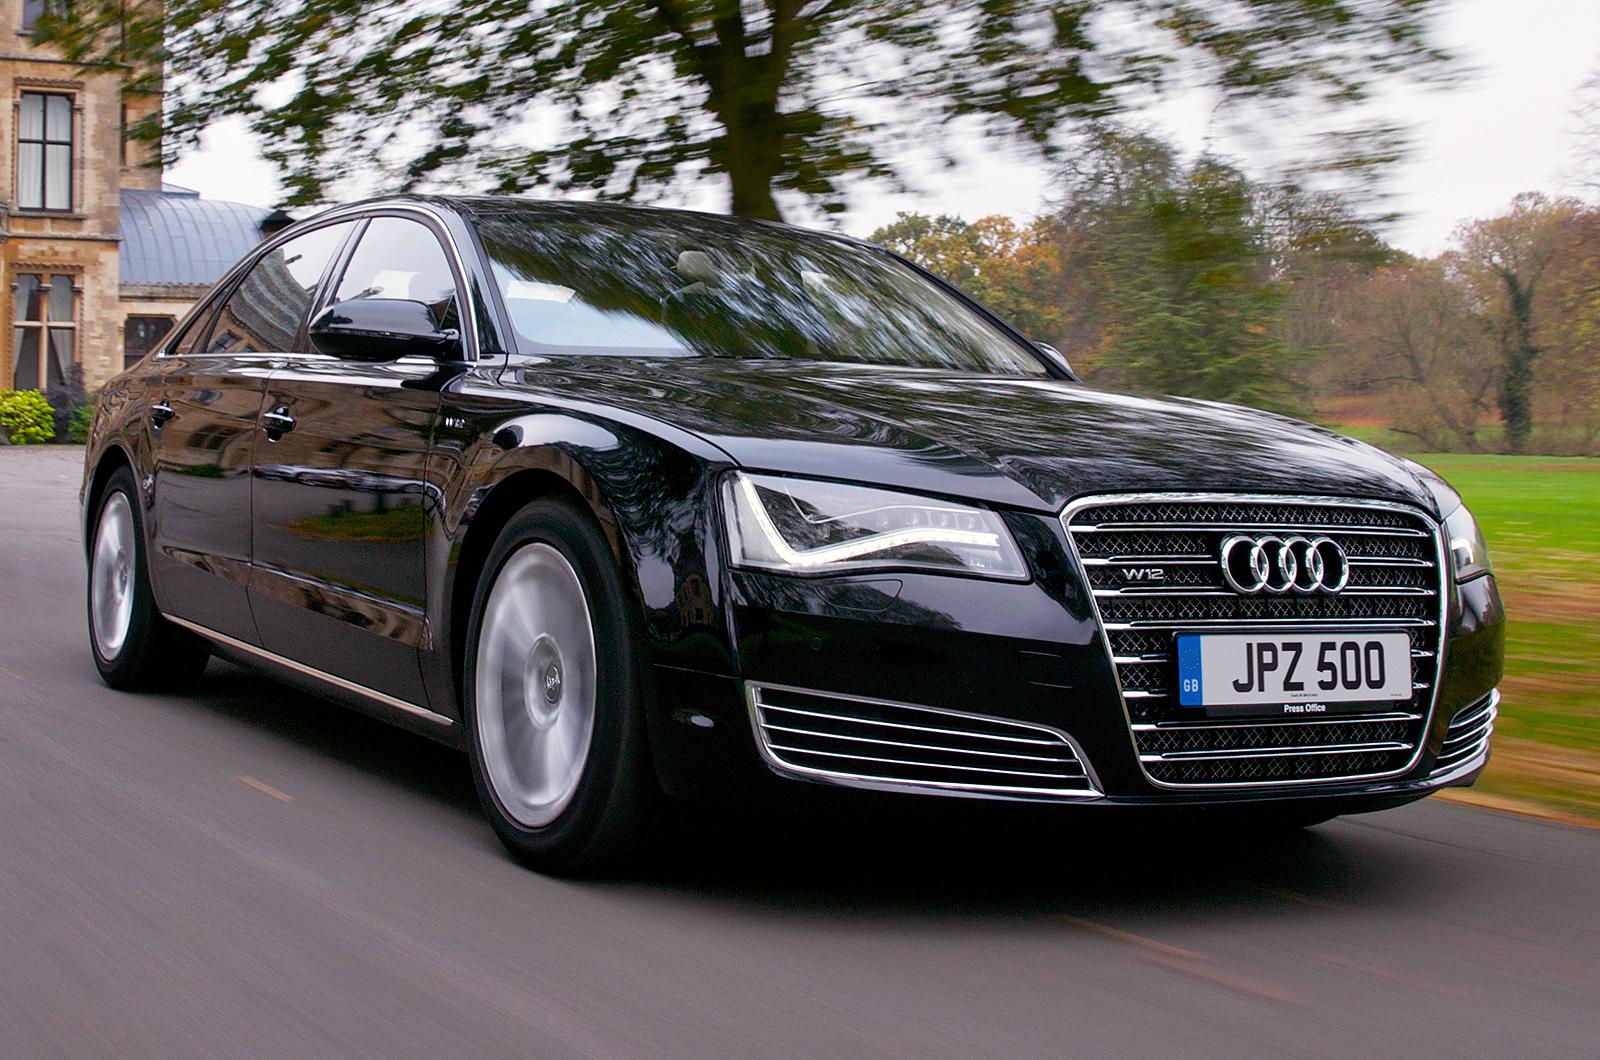 Kekurangan Audi A8 V12 Harga